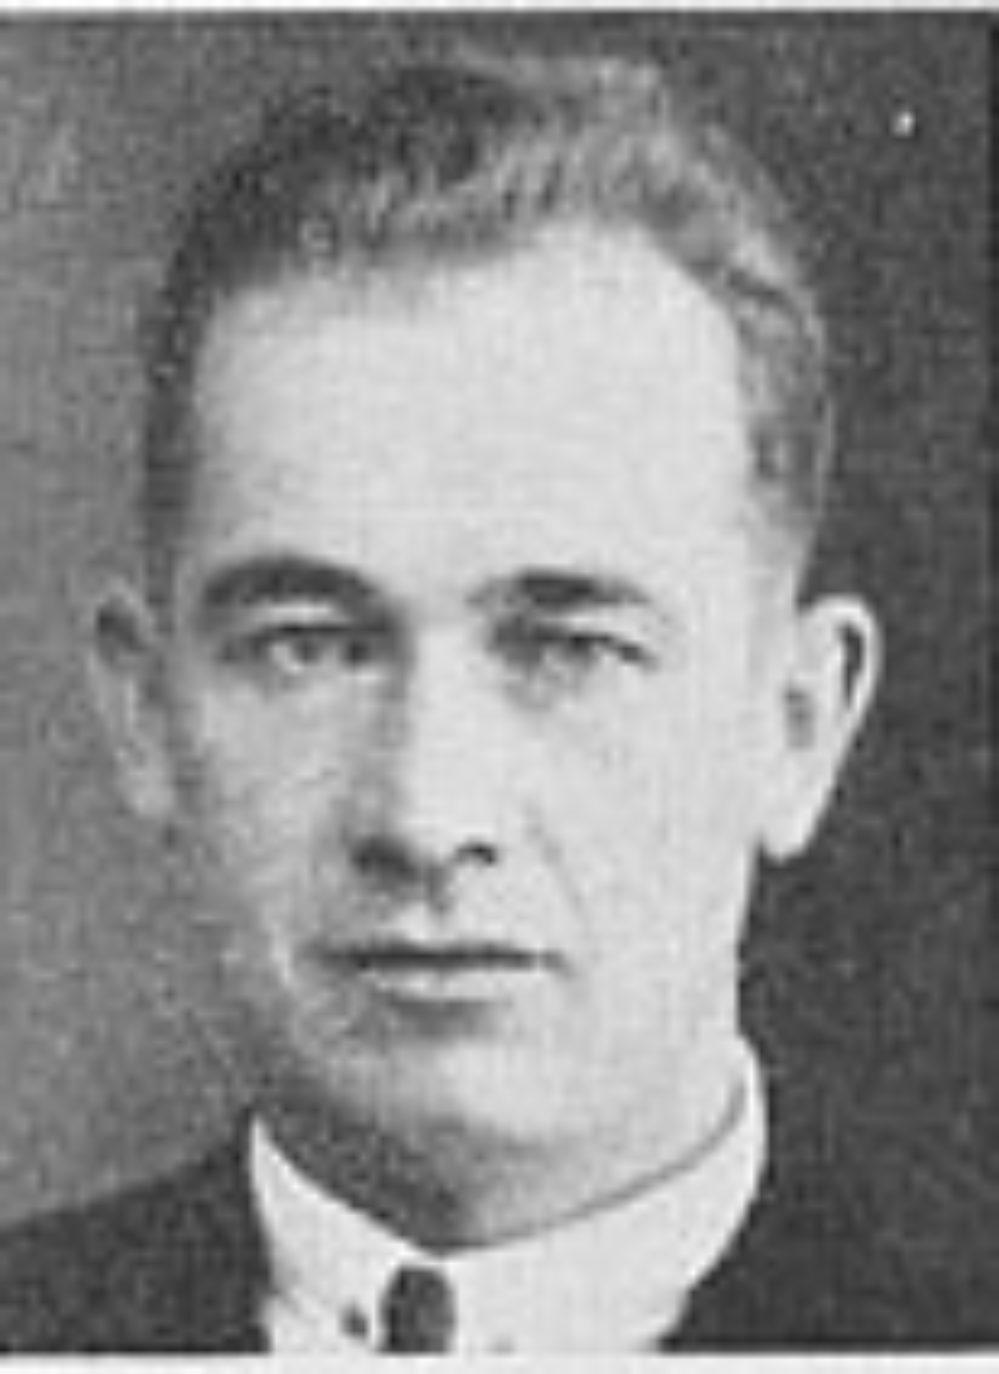 Gustav Adolf Johannessen